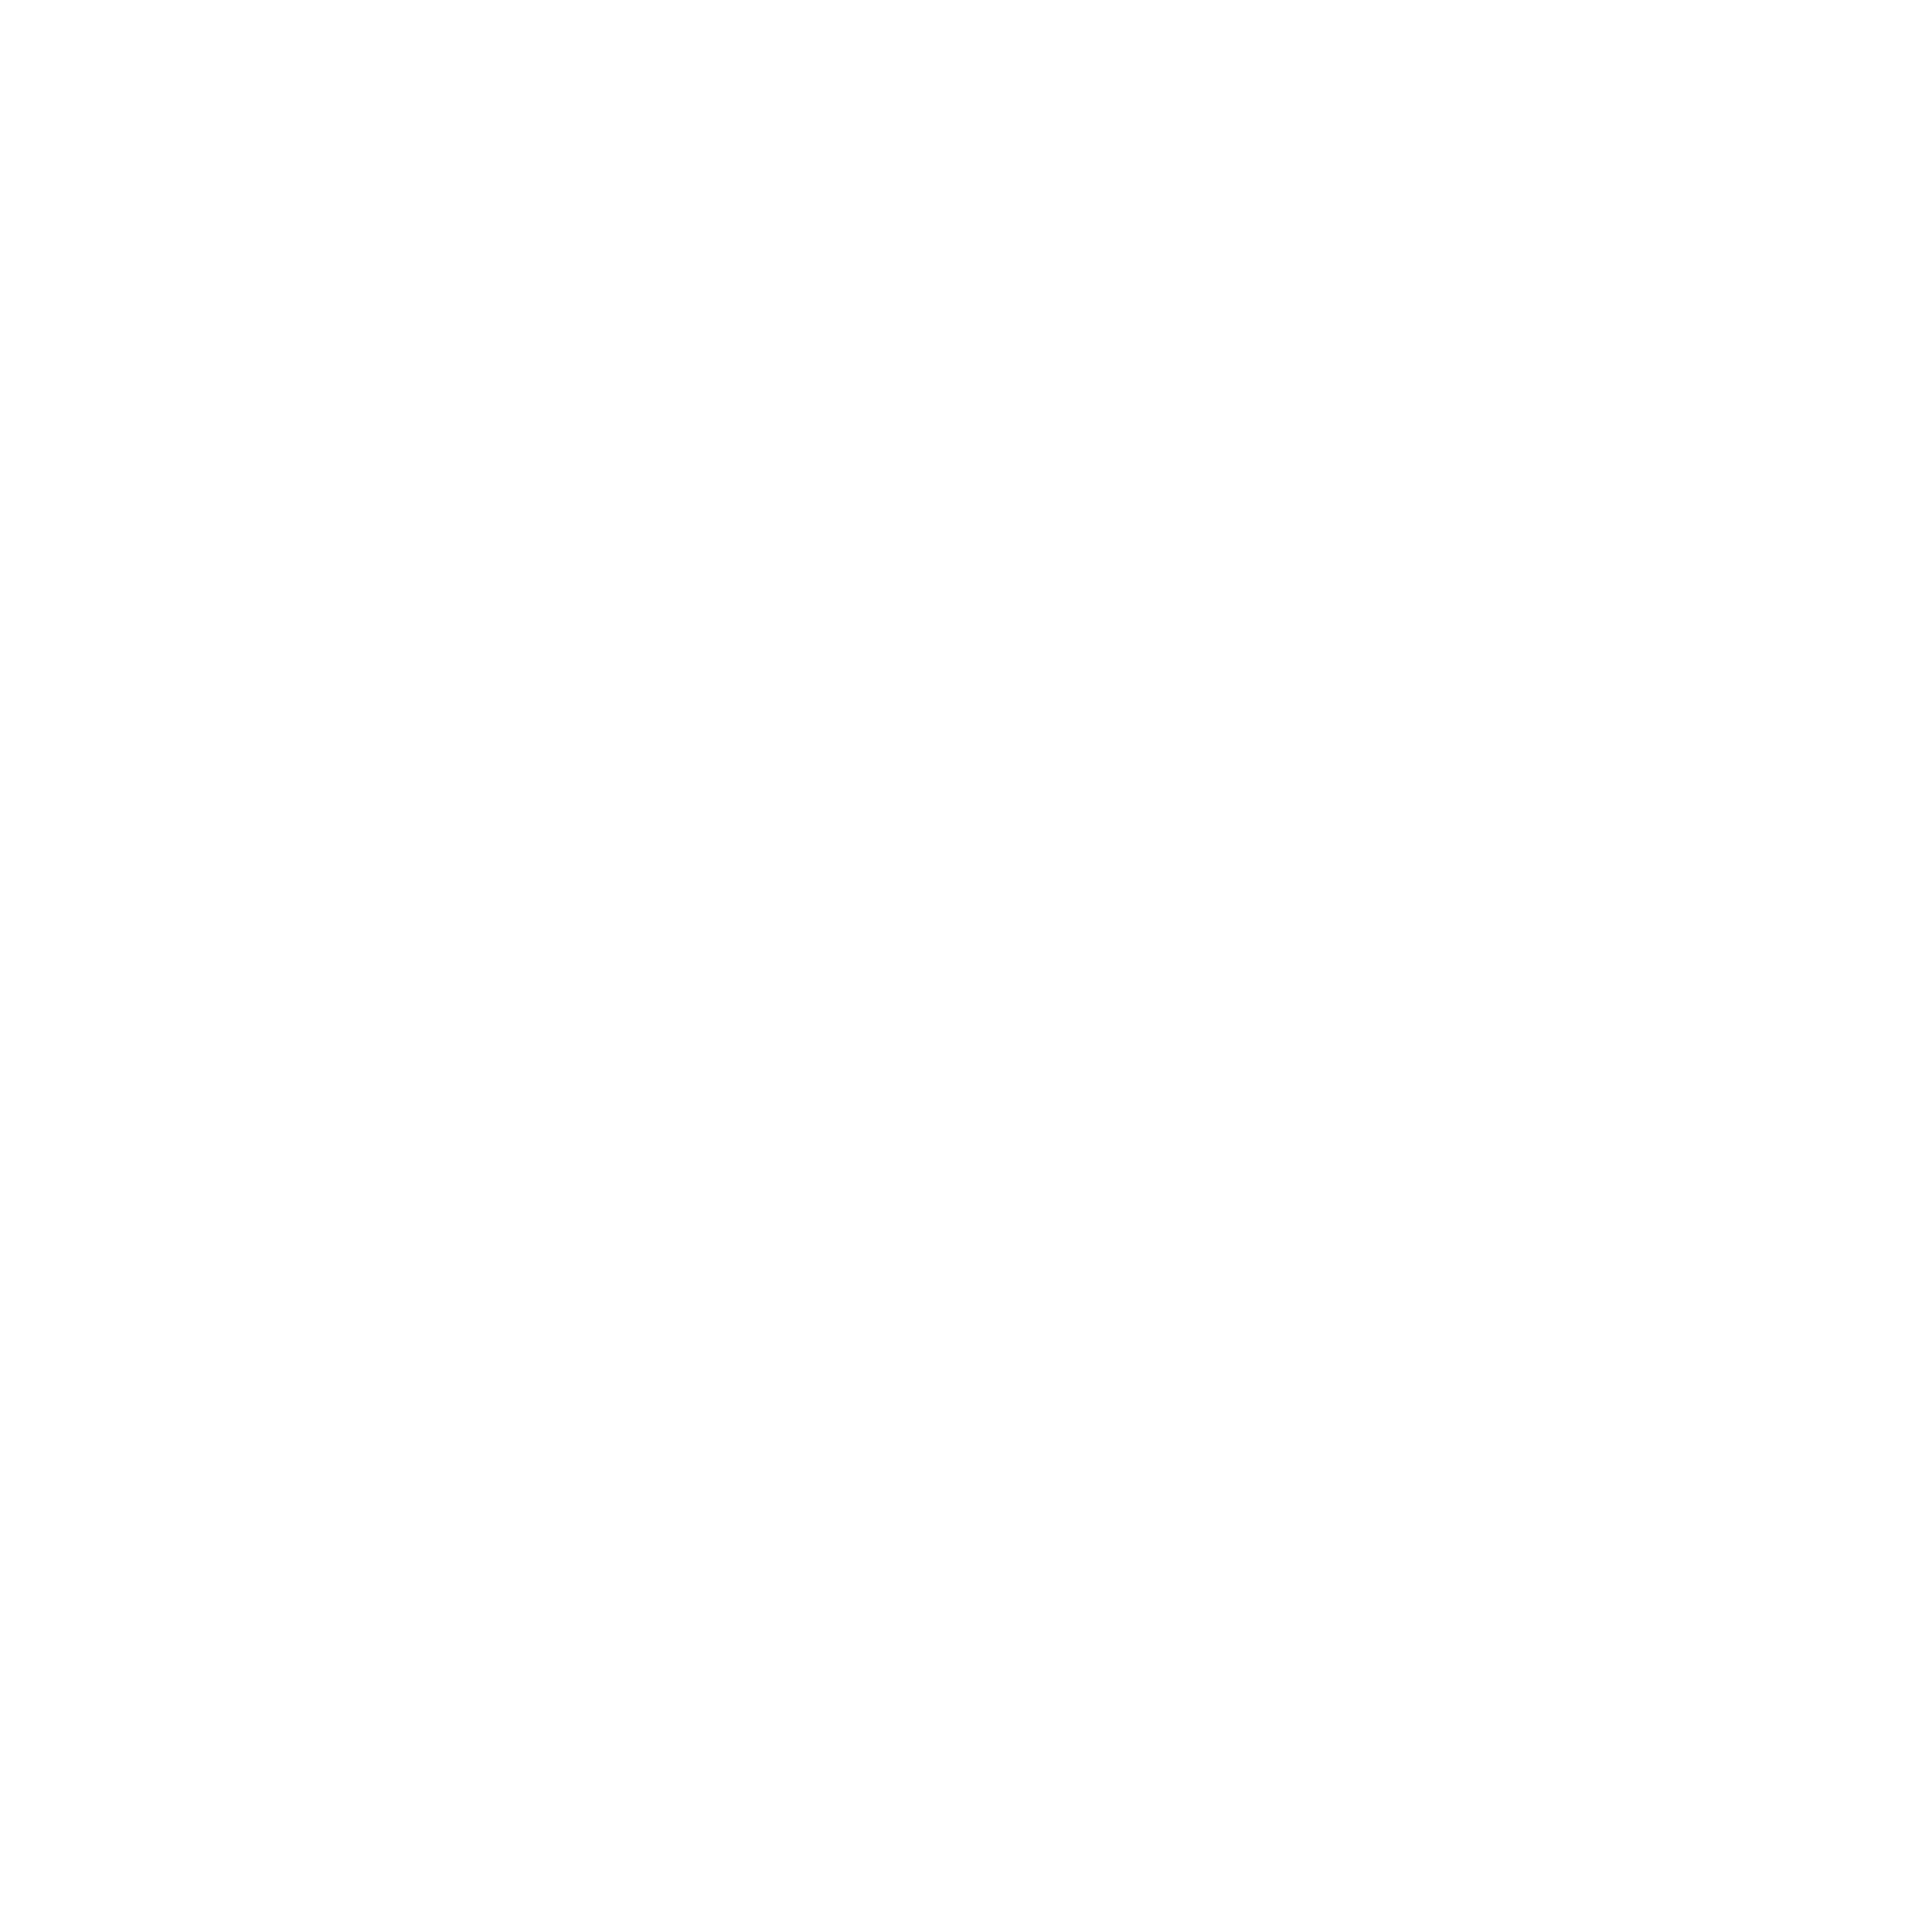 CHRYSLER-1.png